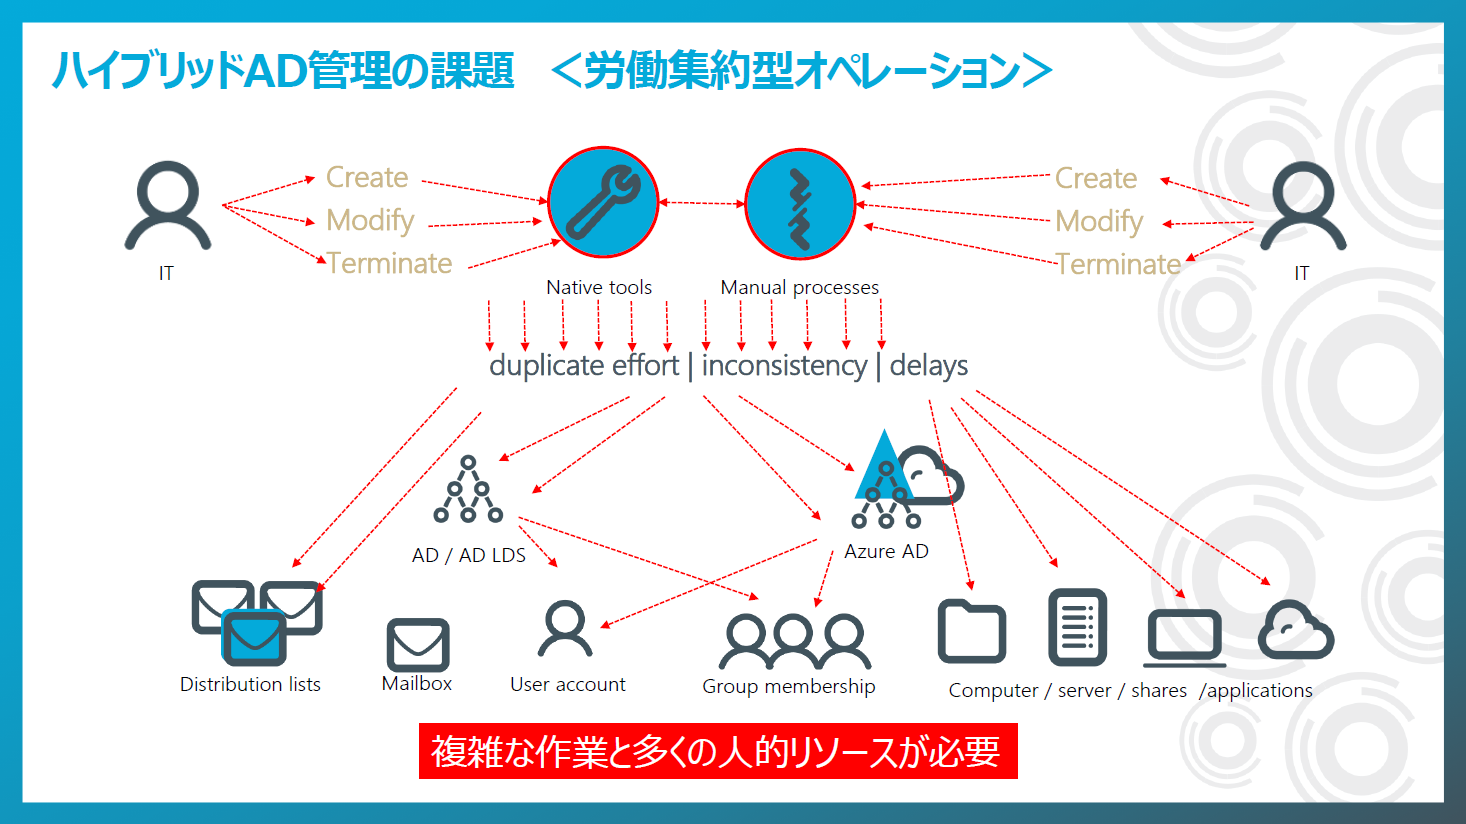 pitfalls-Active Directory and Azure AD-Hybrid AD-environment-2